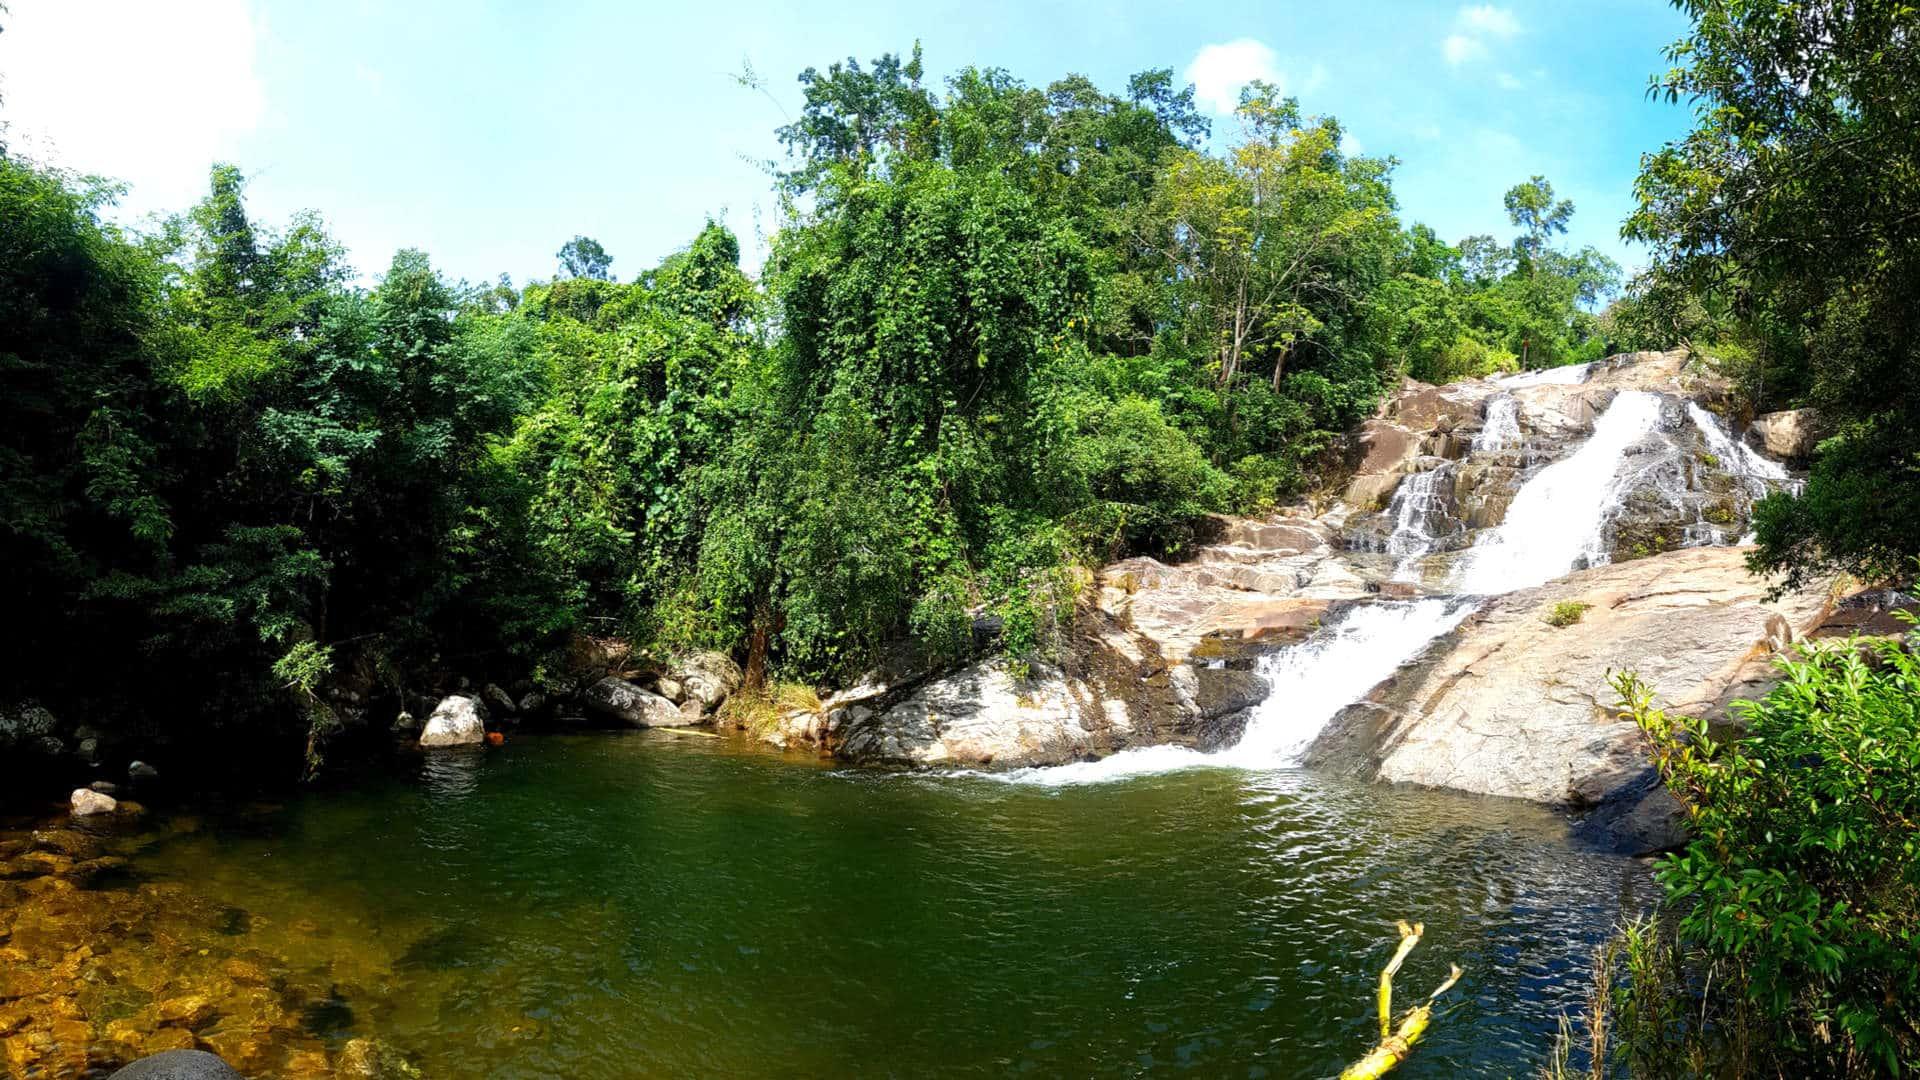 Wasserfall Mid Highlands Dak Lak Provinz Vietnam